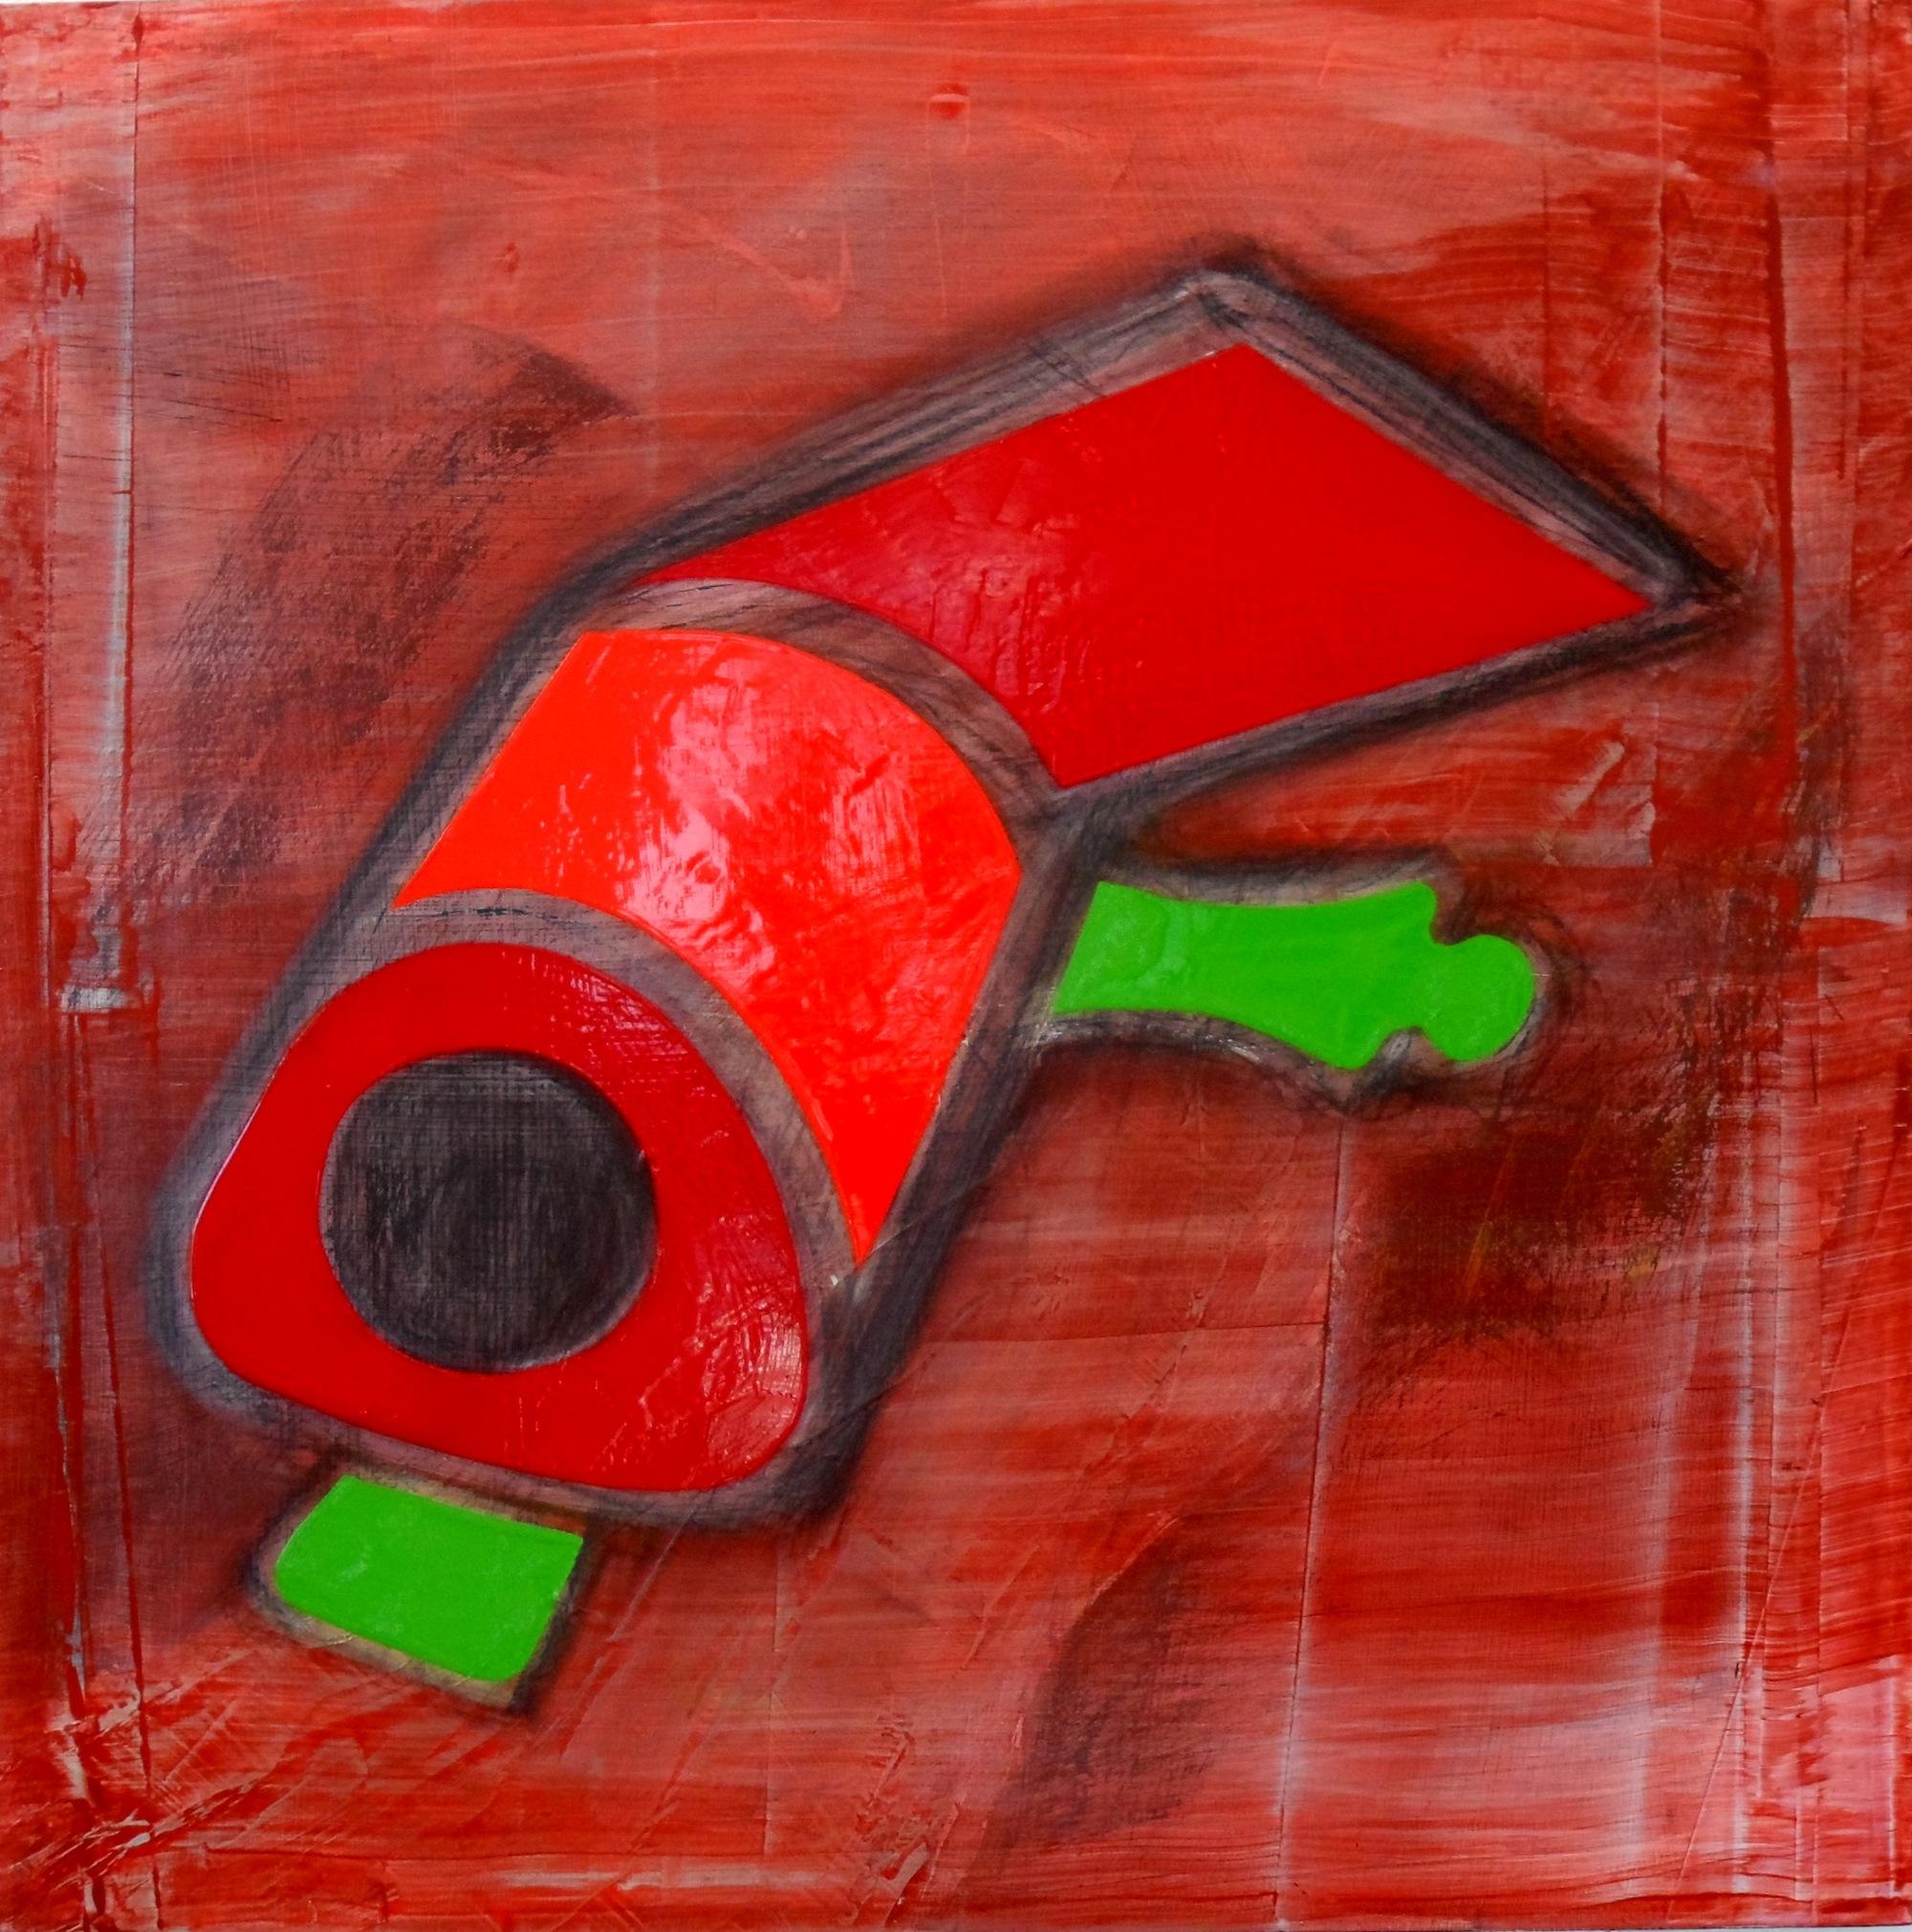 Objet d'Art 2, Acrylic and oil on board